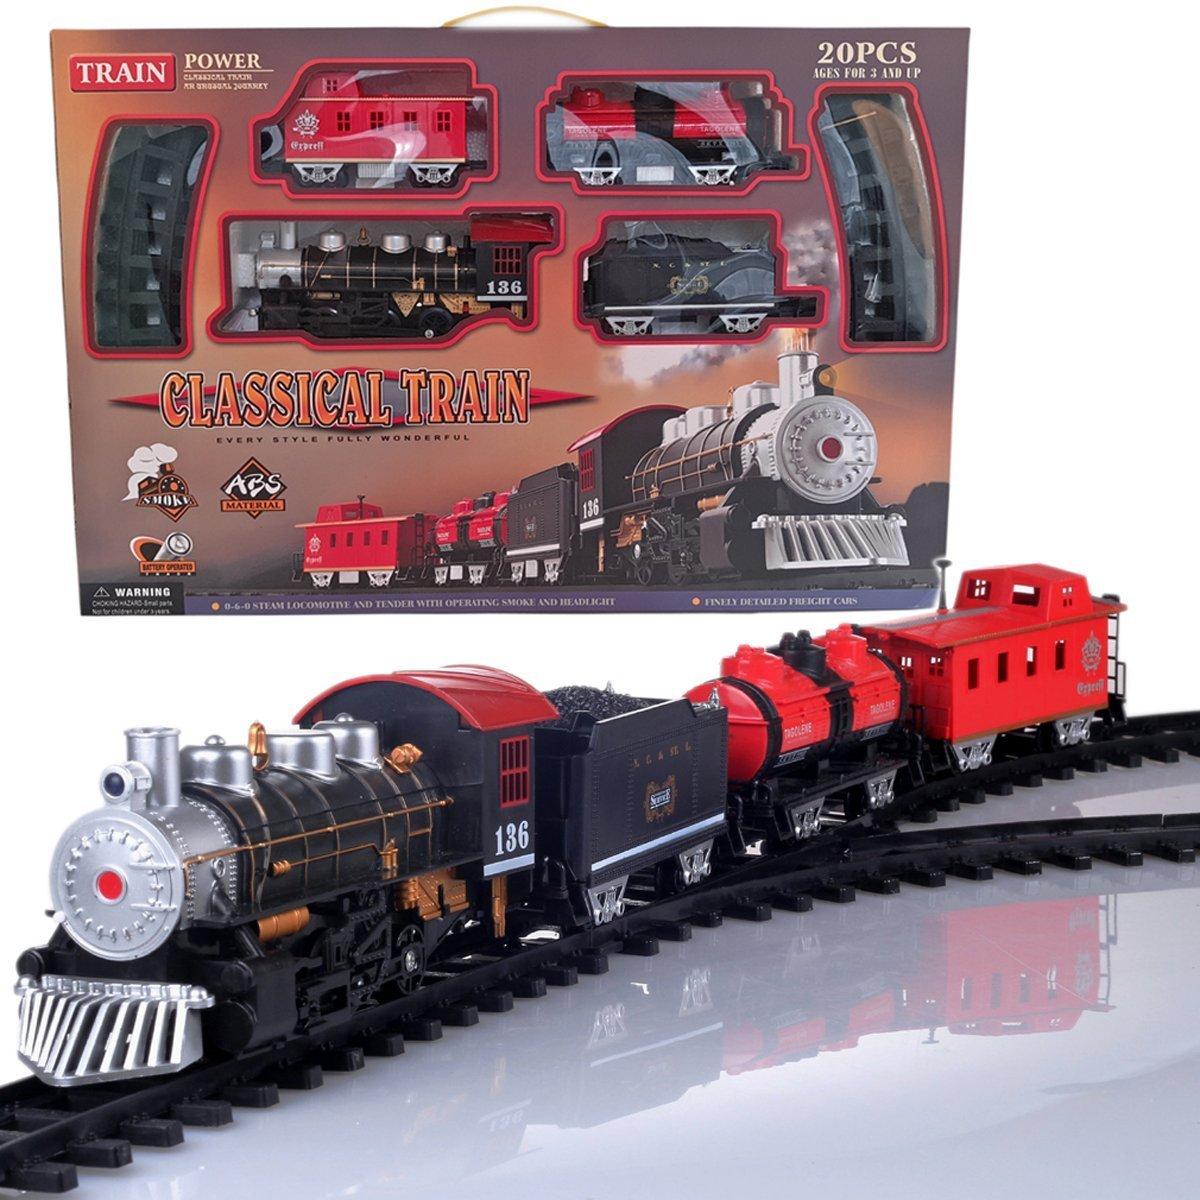 Bowen Toy Train Set, Classical Electric Train Set Steam Smoking Simulation Sound Train for Kids